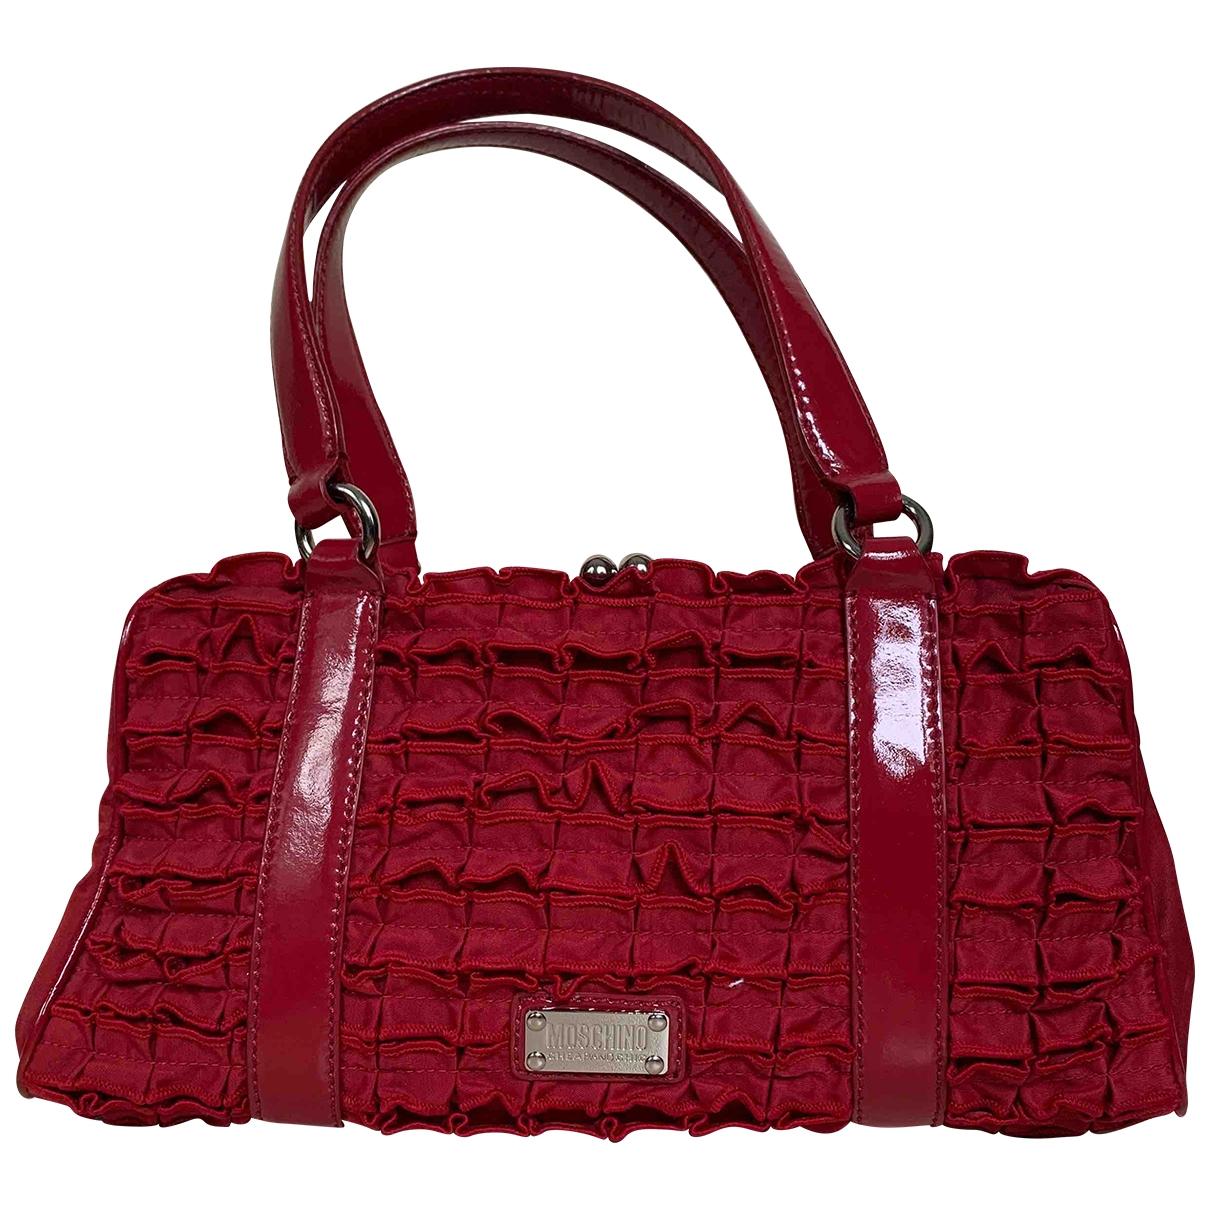 Moschino Cheap And Chic \N Handtasche in  Rot Leinen